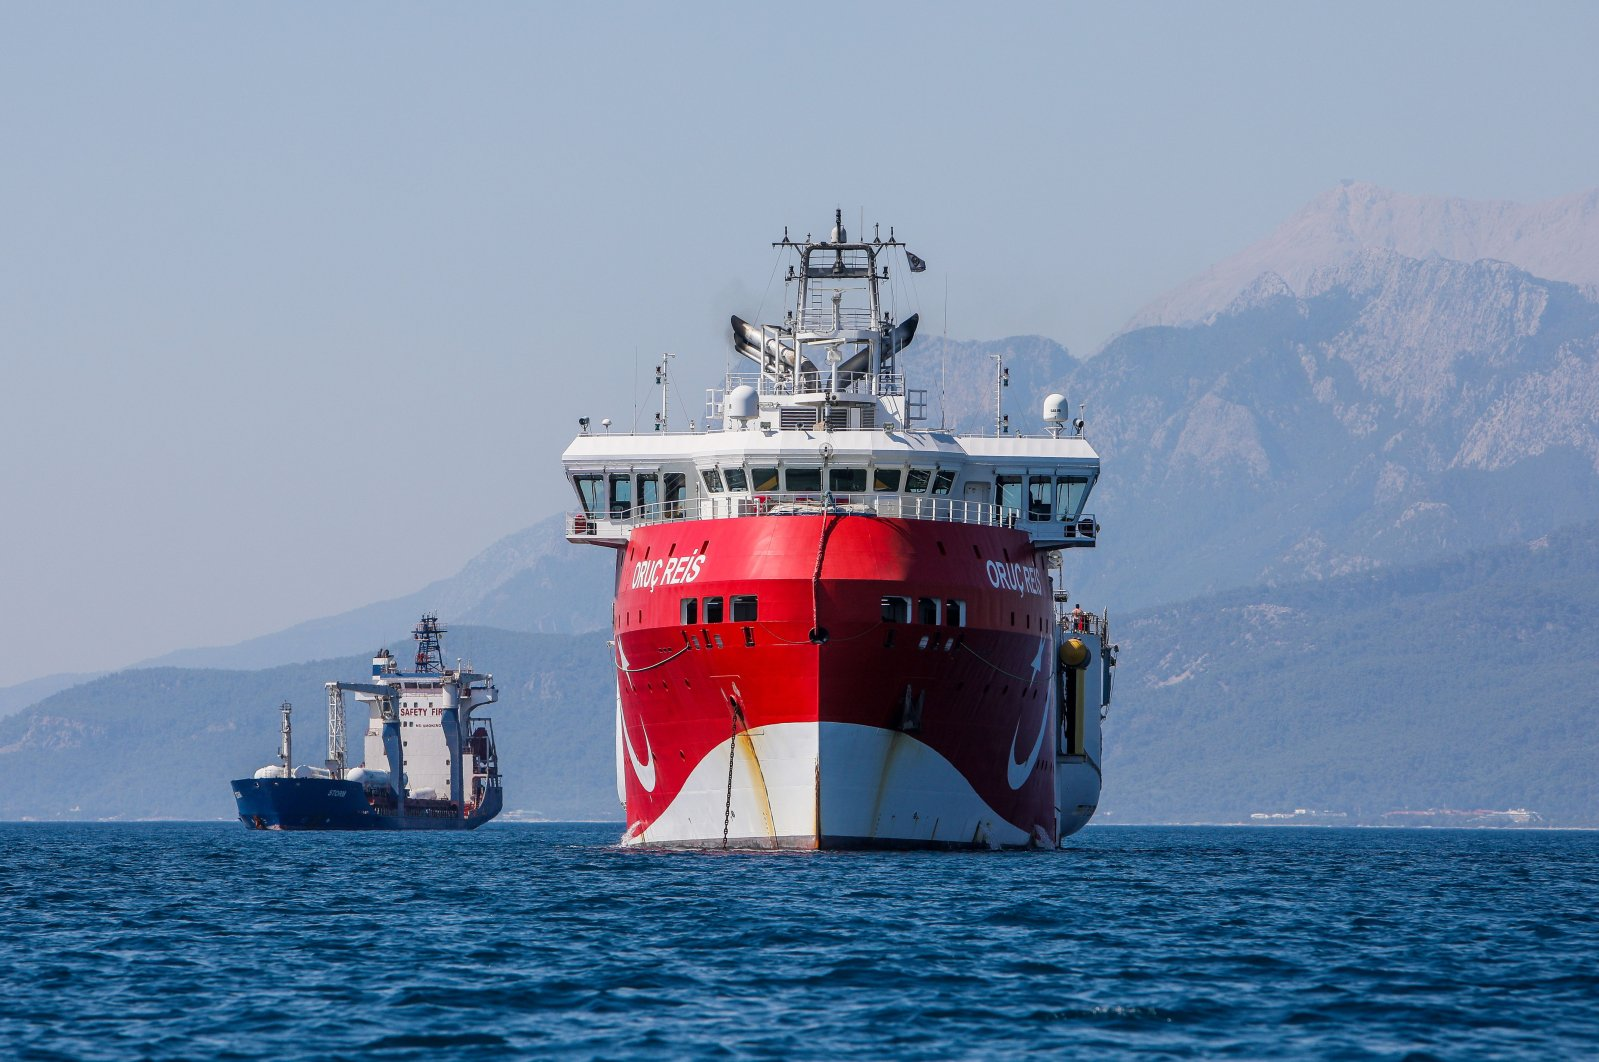 Turkey's seismic exploration vessel Oruç Reis is seen off the shore of Antalya, southwest Turkey, July 24, 2020. (DHA Photo)